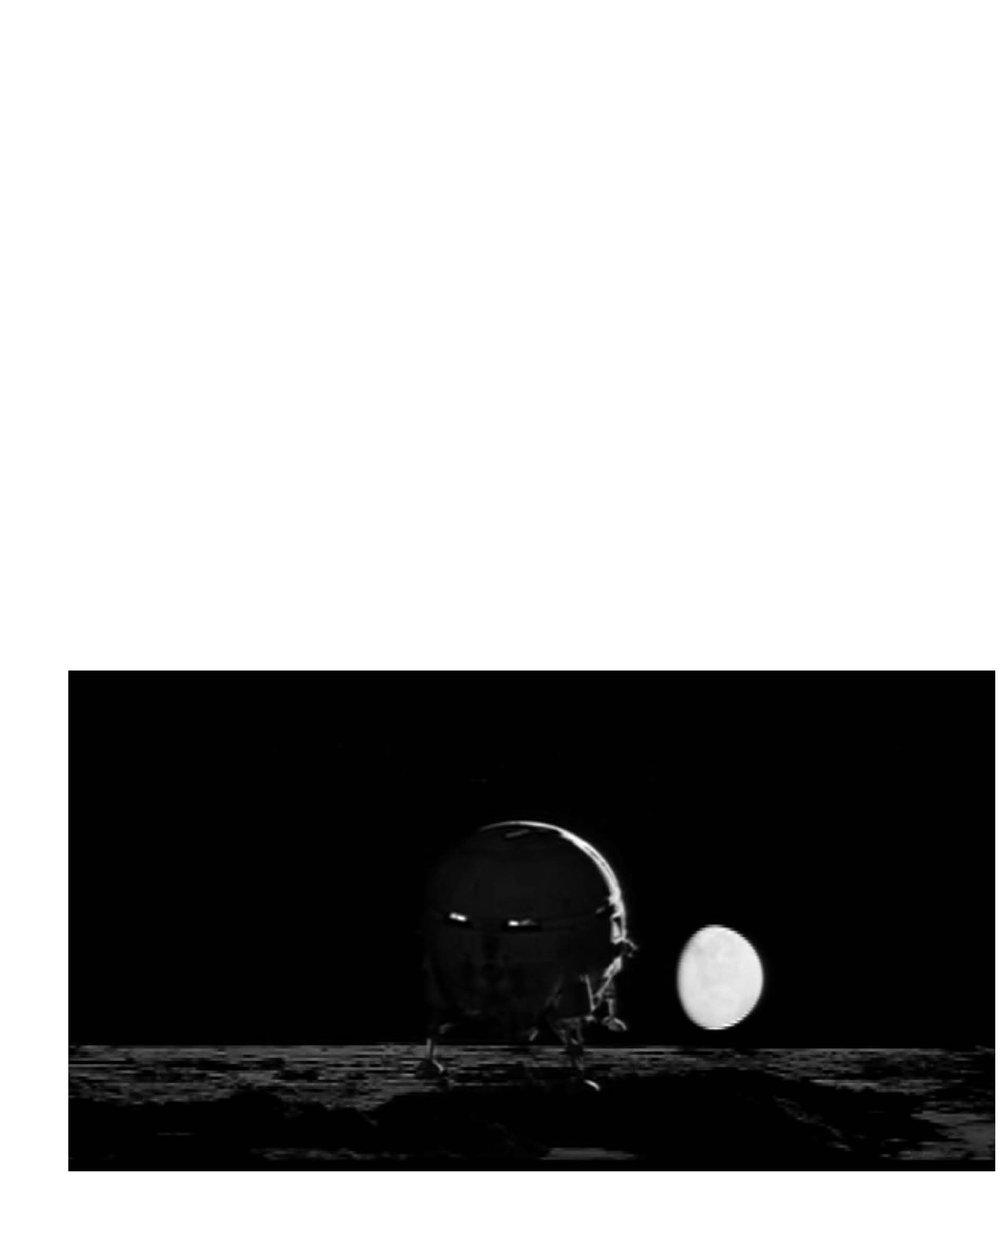 256_Final_Page_062.jpg